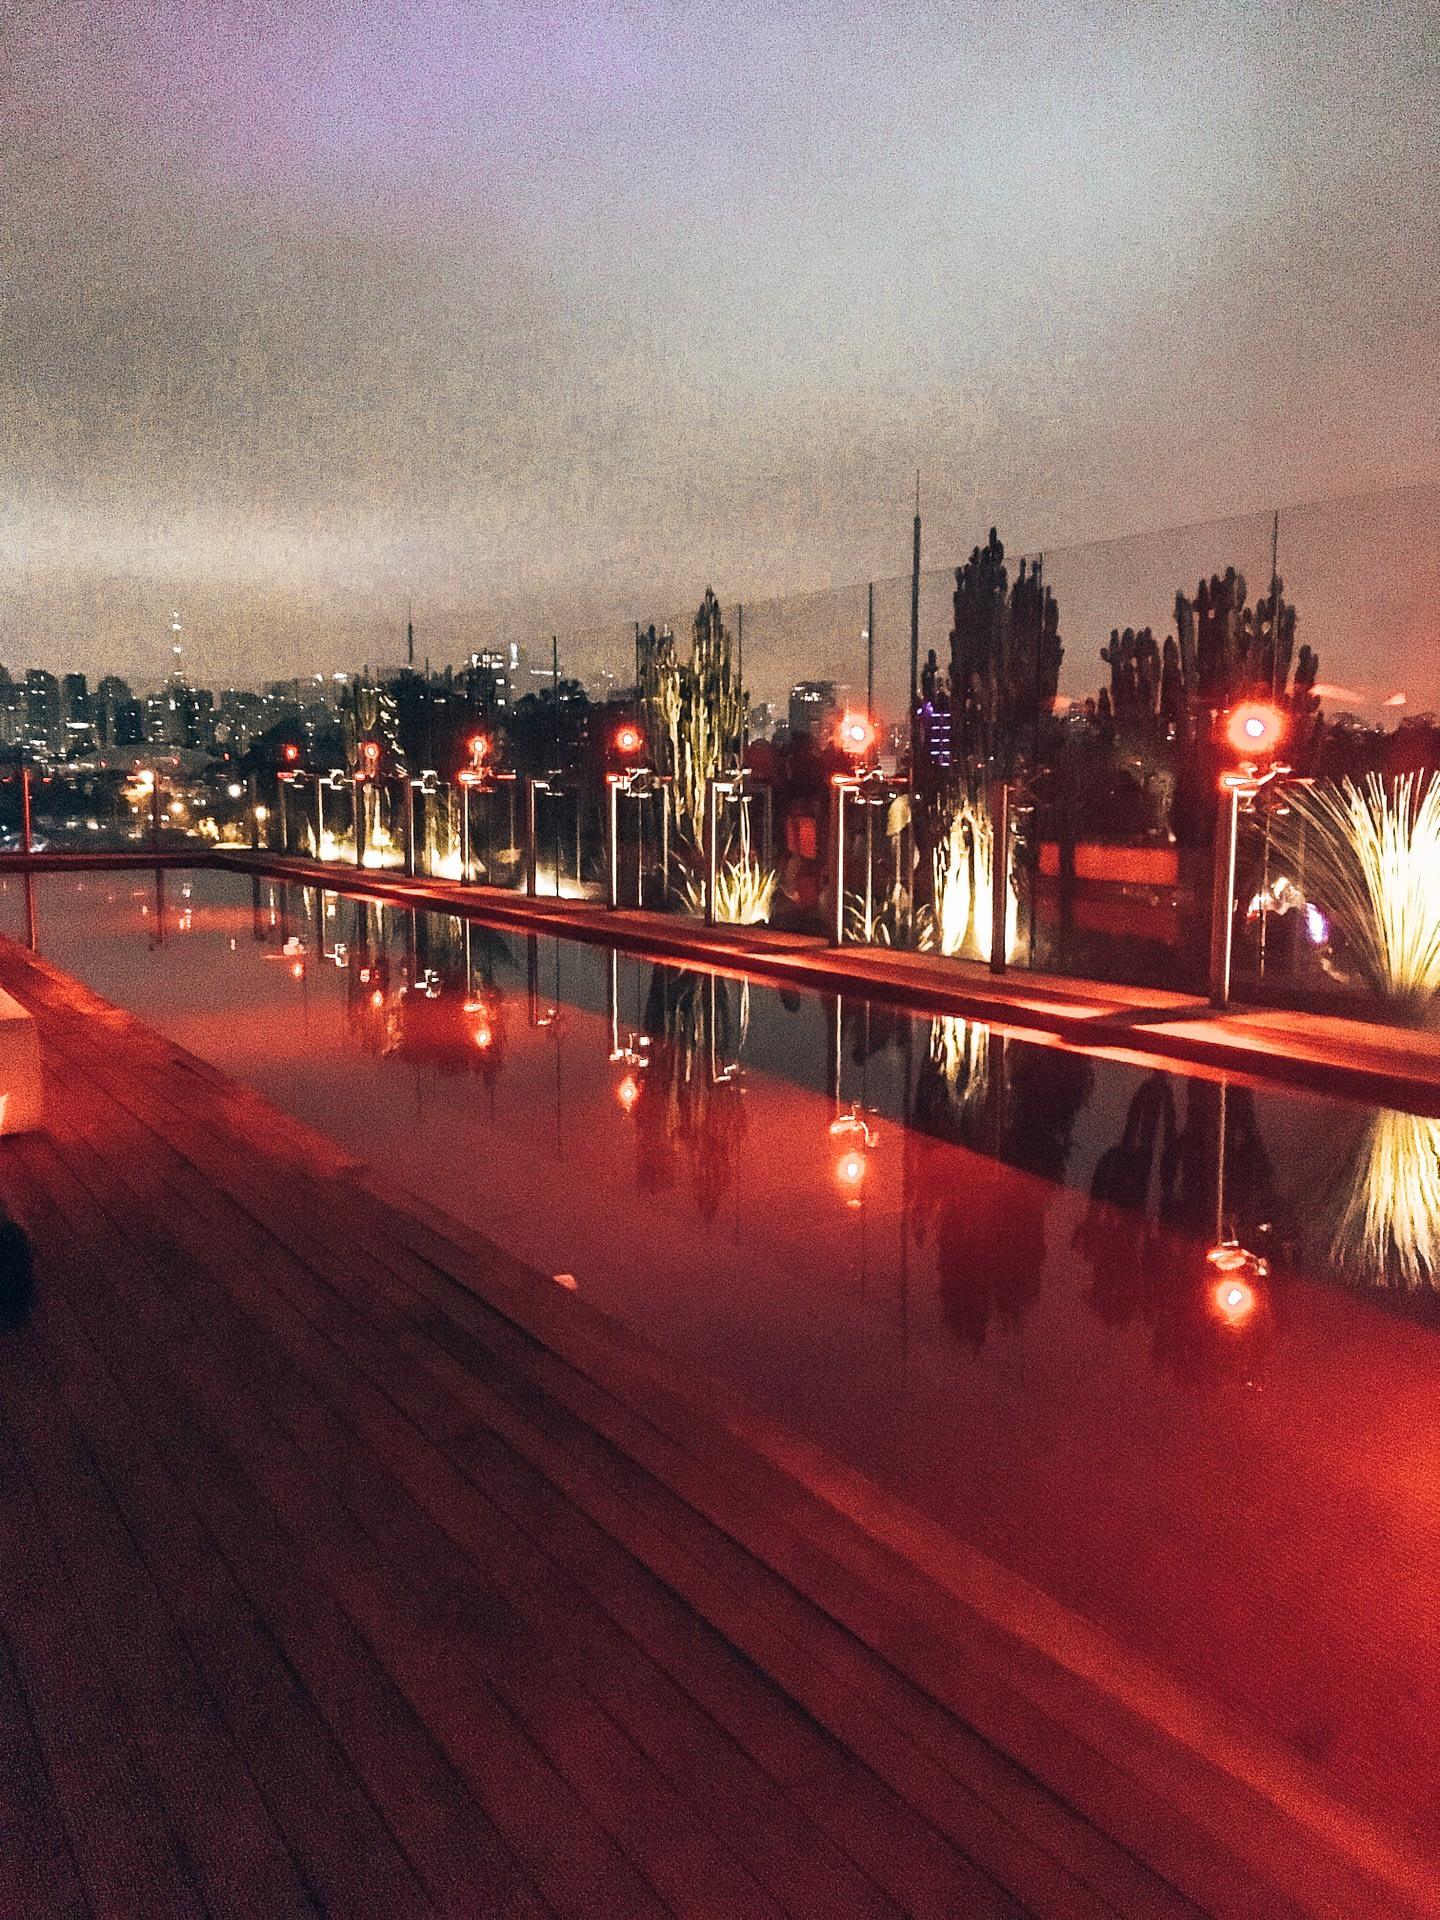 Skye Bar Red Pool São Paulo